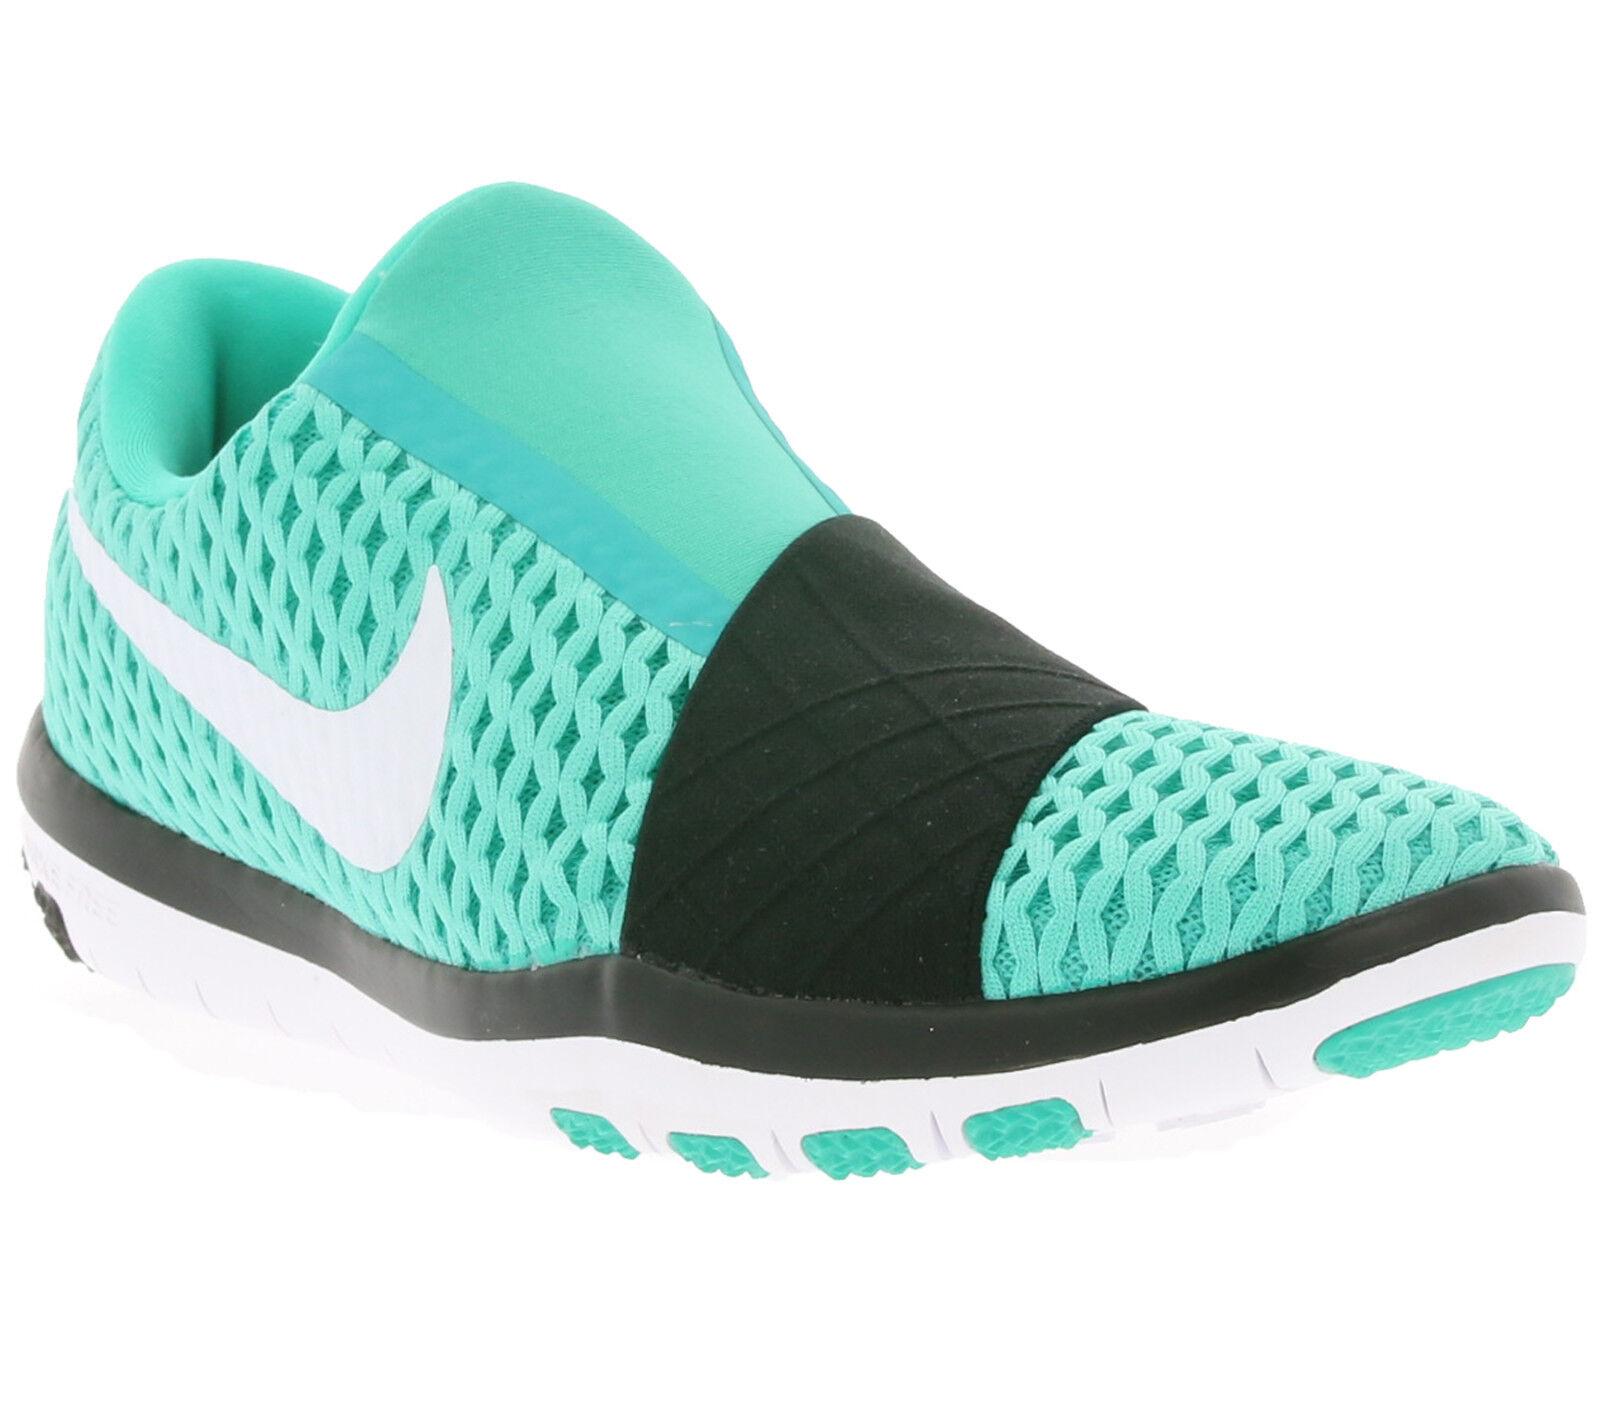 Nike Free Schuhe 3.0 V4 Holzkohle Grün